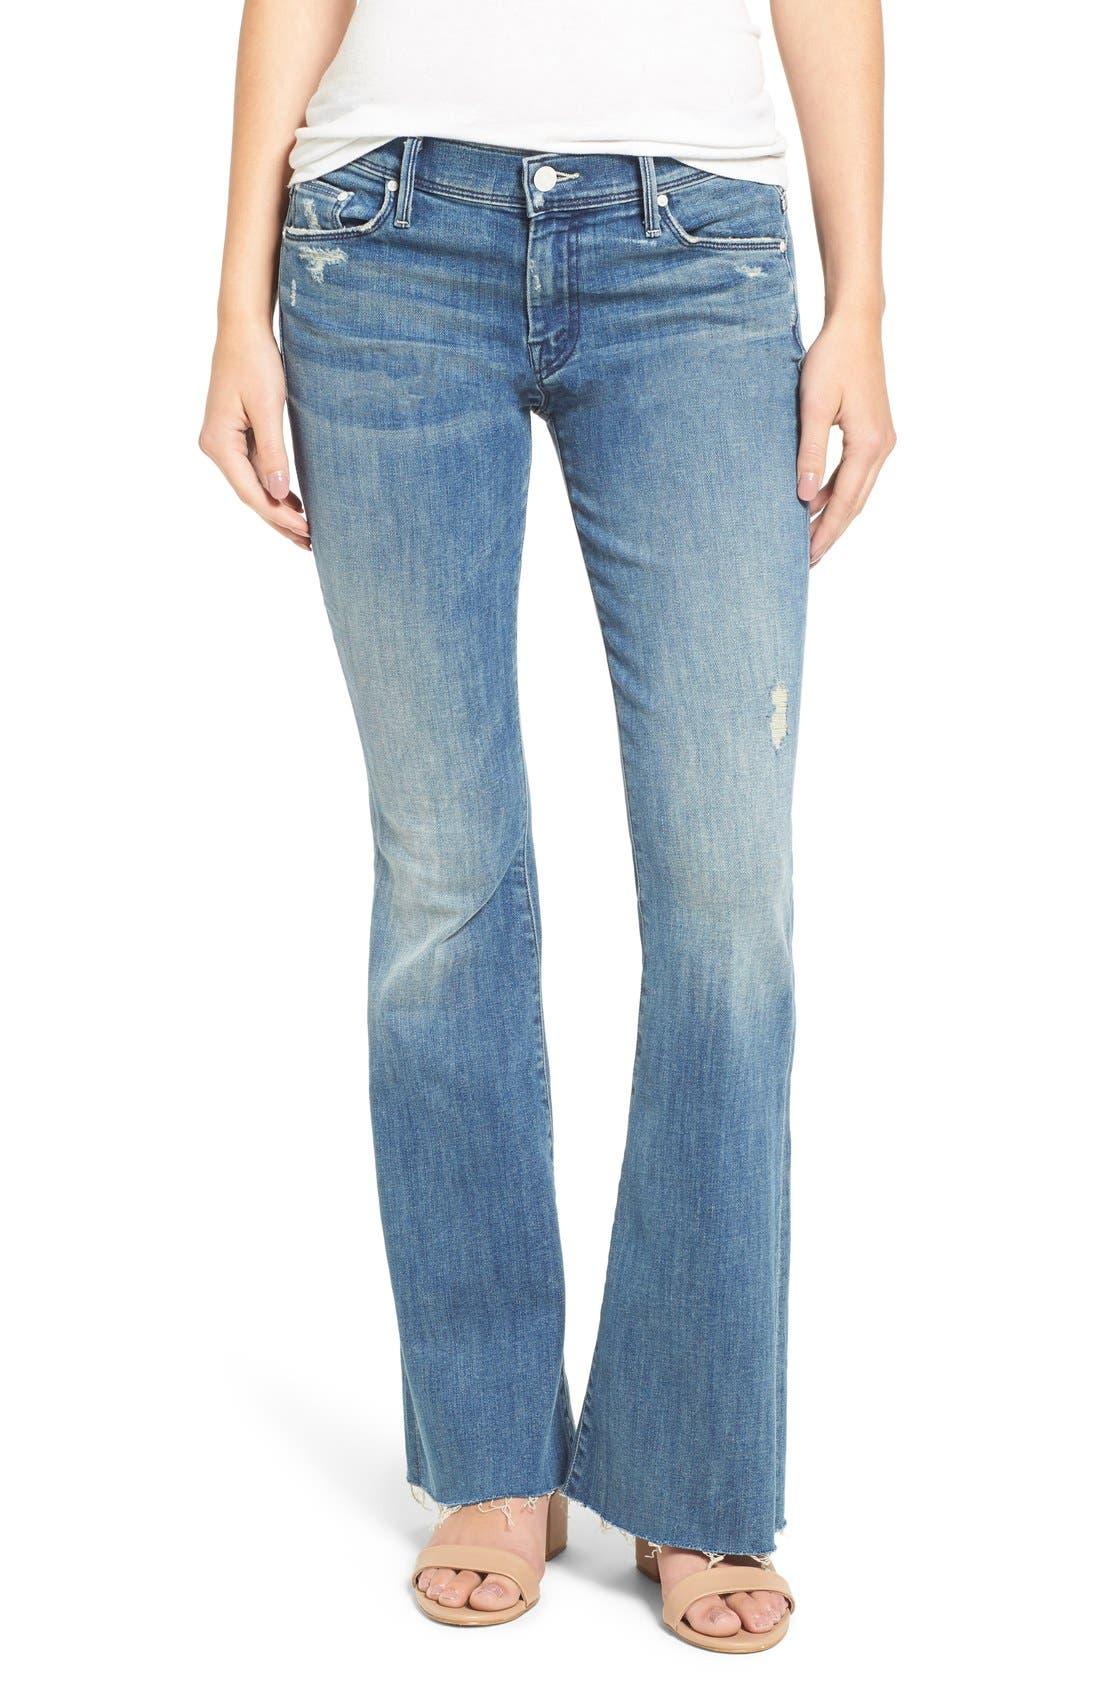 Alternate Image 1 Selected - MOTHER Raw Hem Flare Jeans (Graffiti Girl)